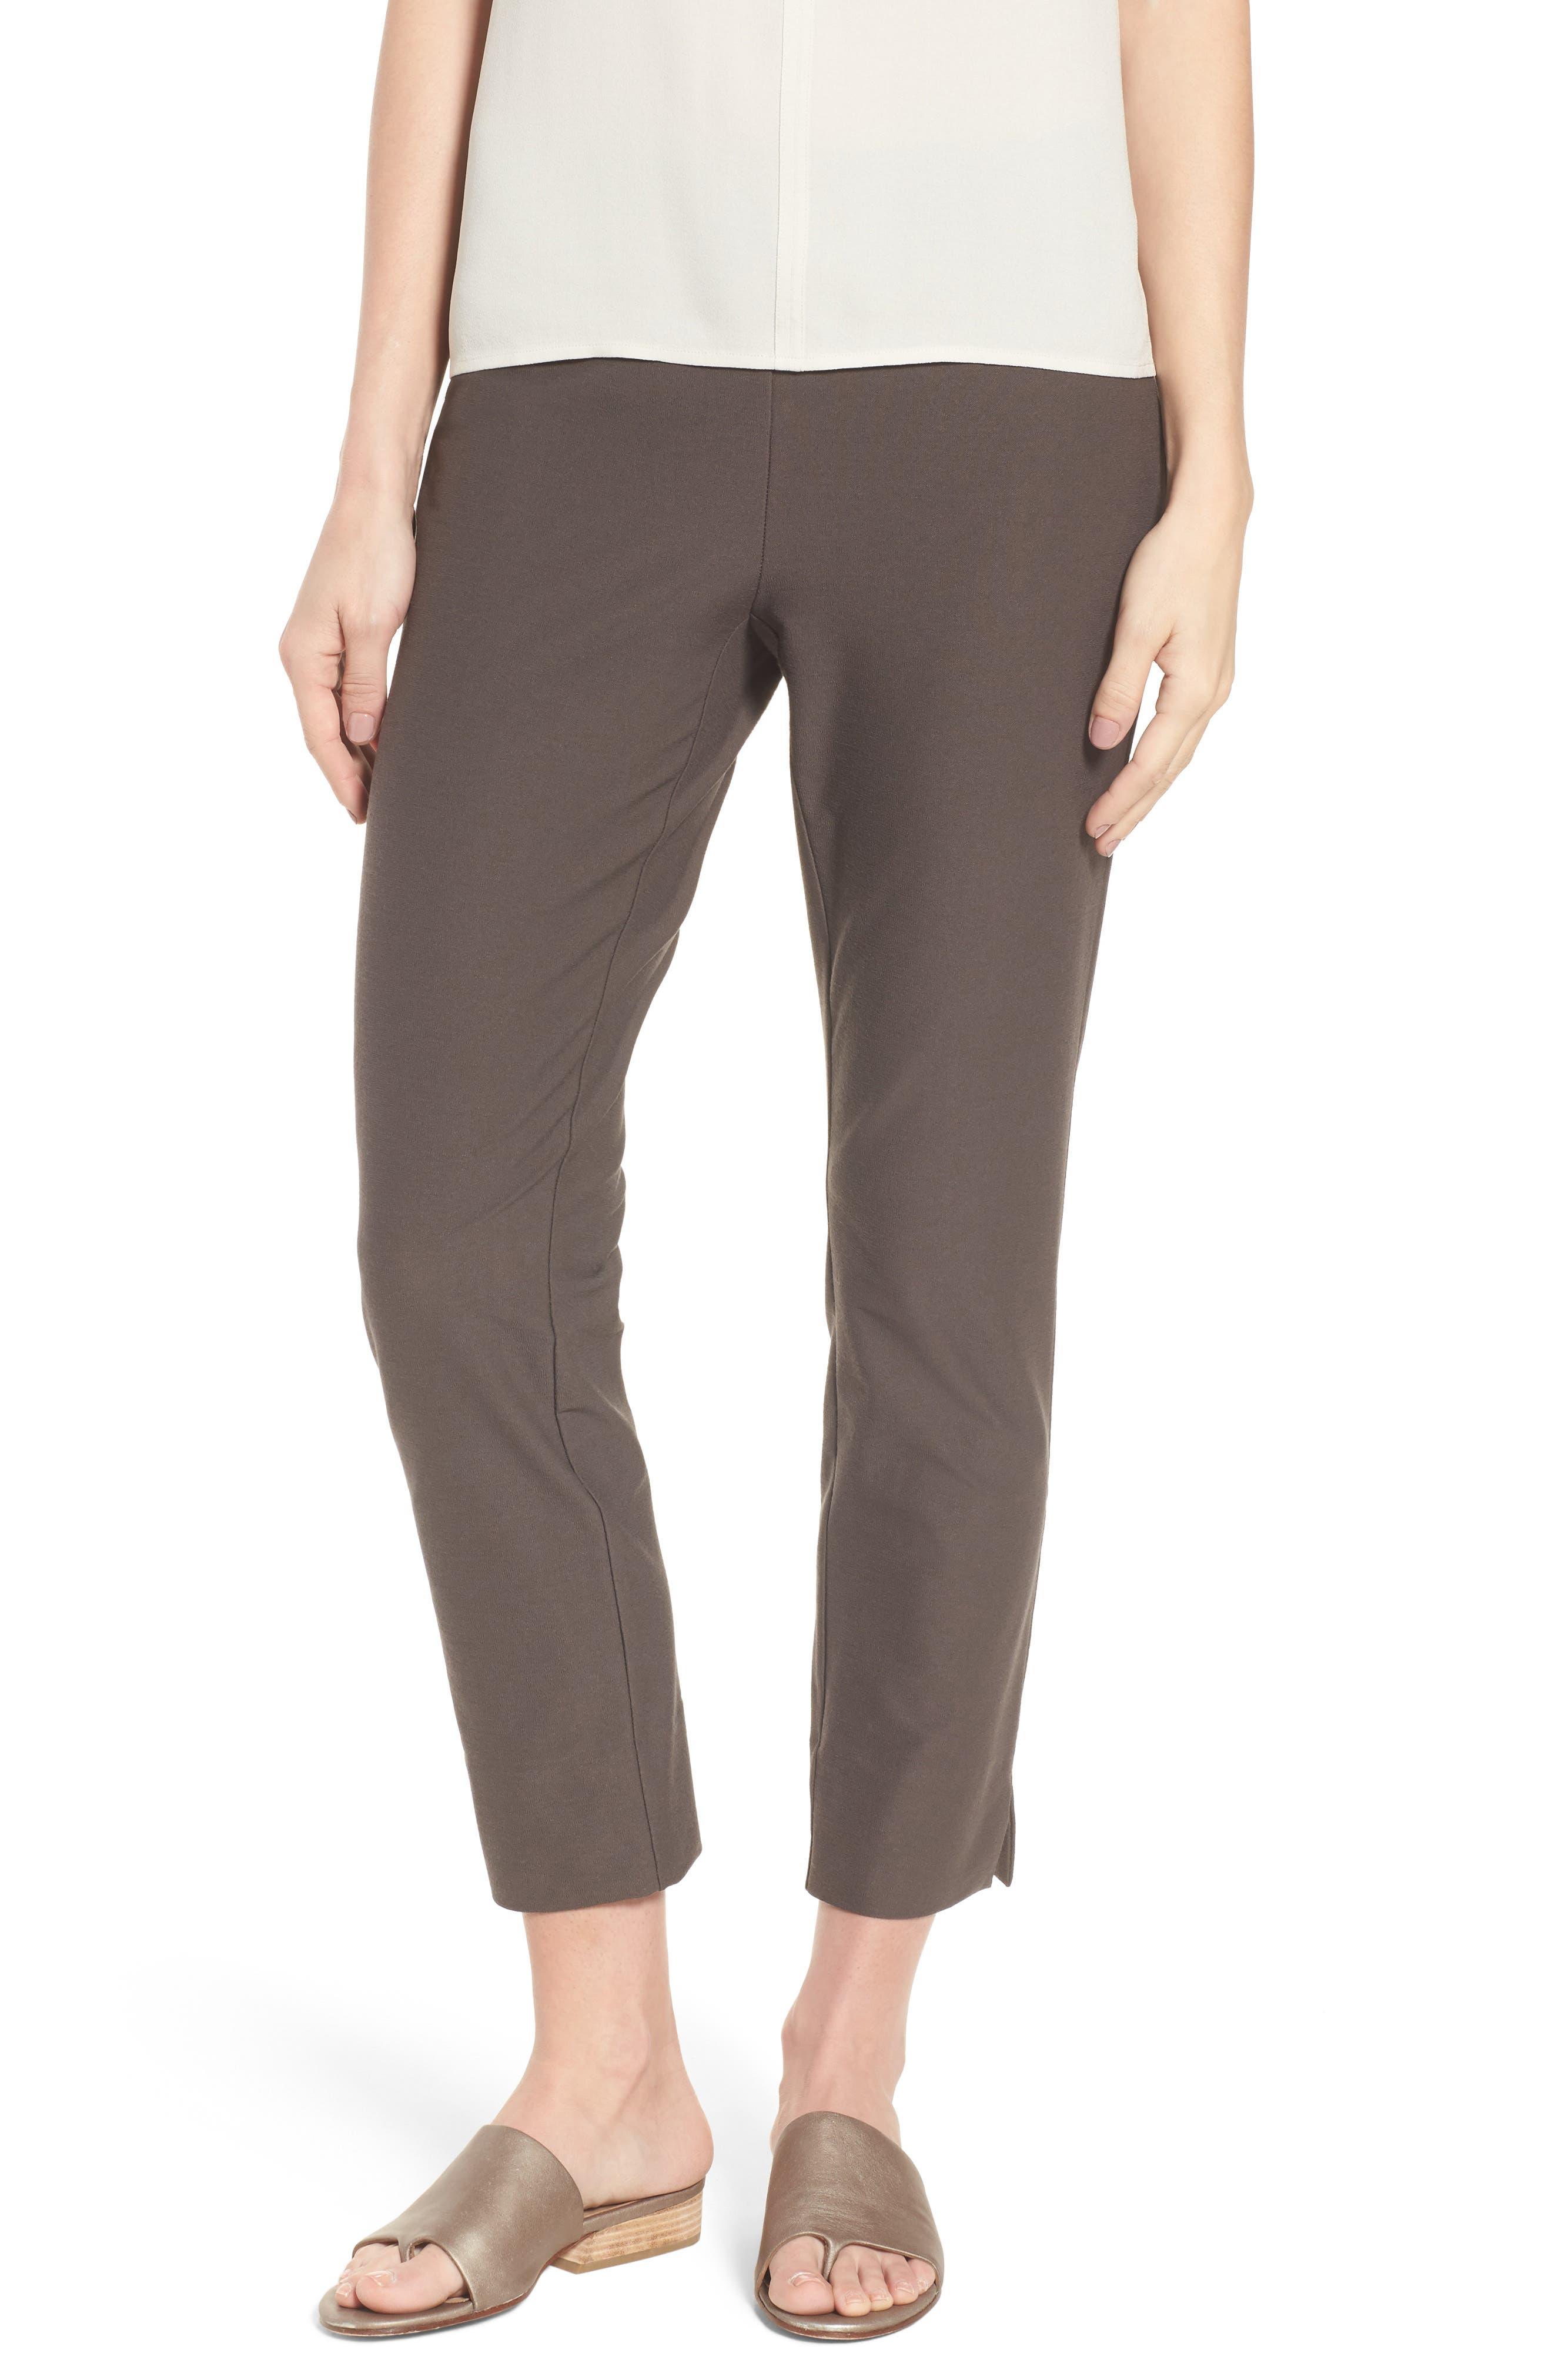 Alternate Image 1 Selected - Eileen Fisher Notch Cuff Slim Crop Pants (Regular & Petite)